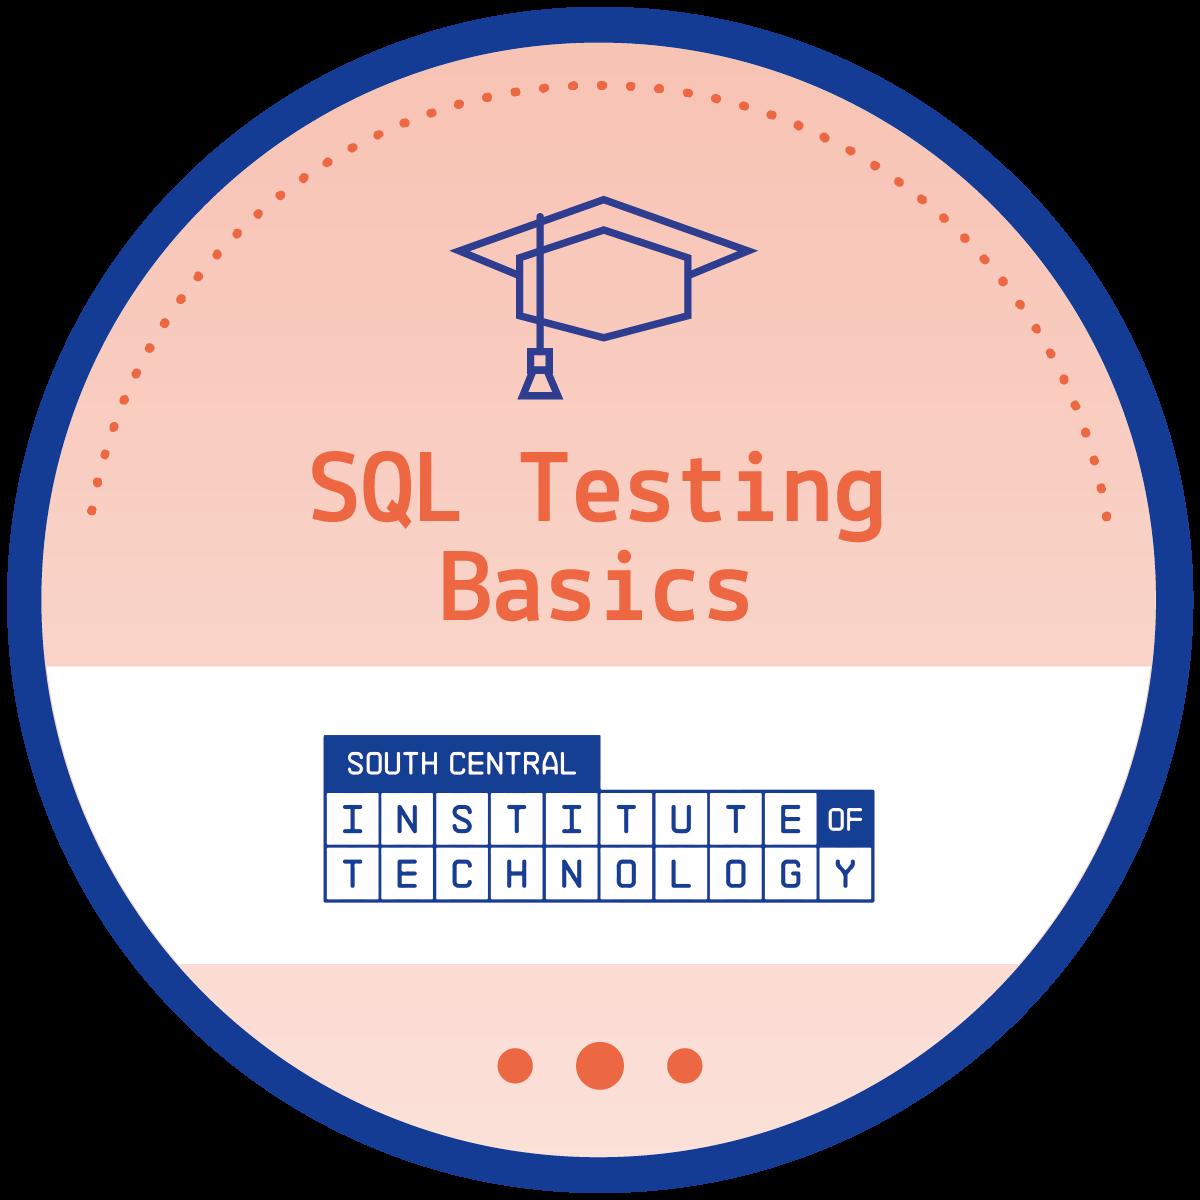 SQL Testing Basics